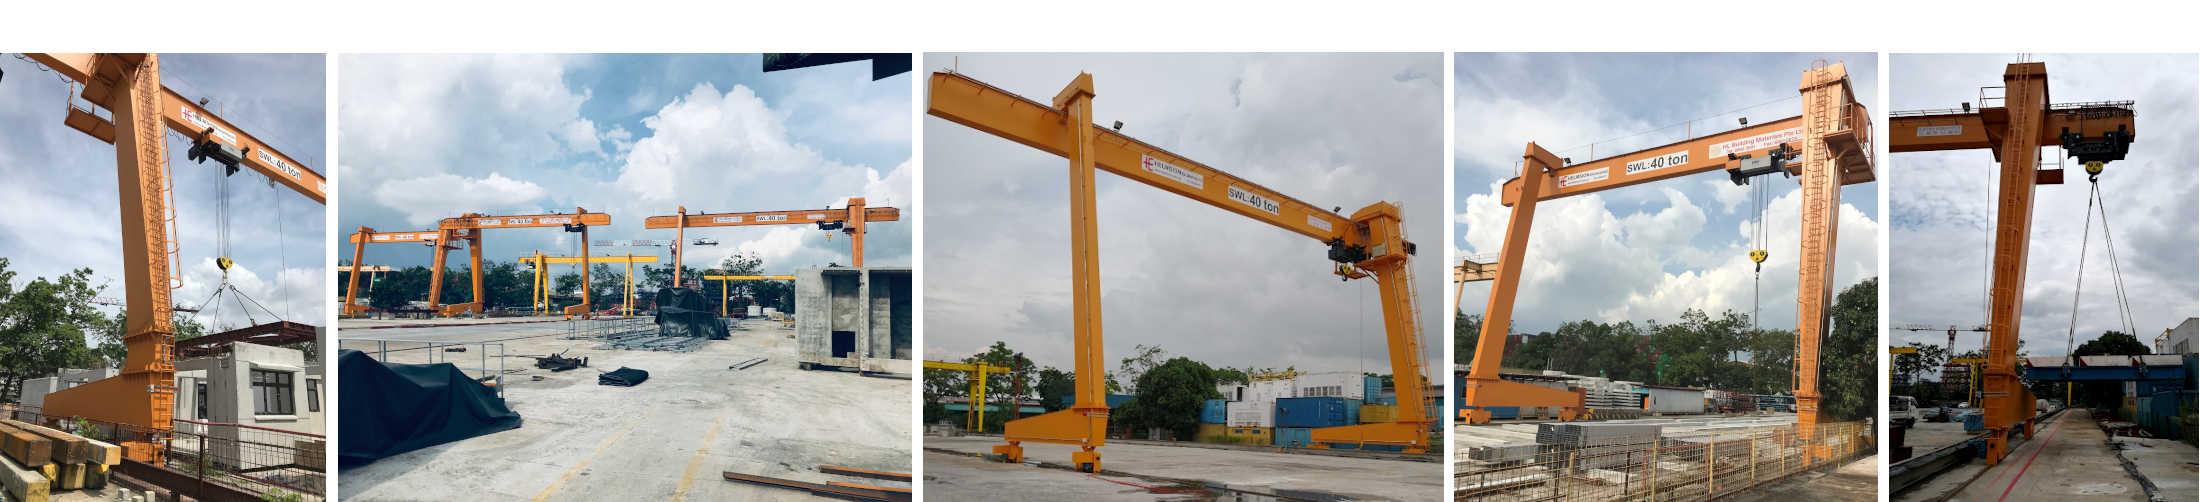 C-Gantry-Crane-3